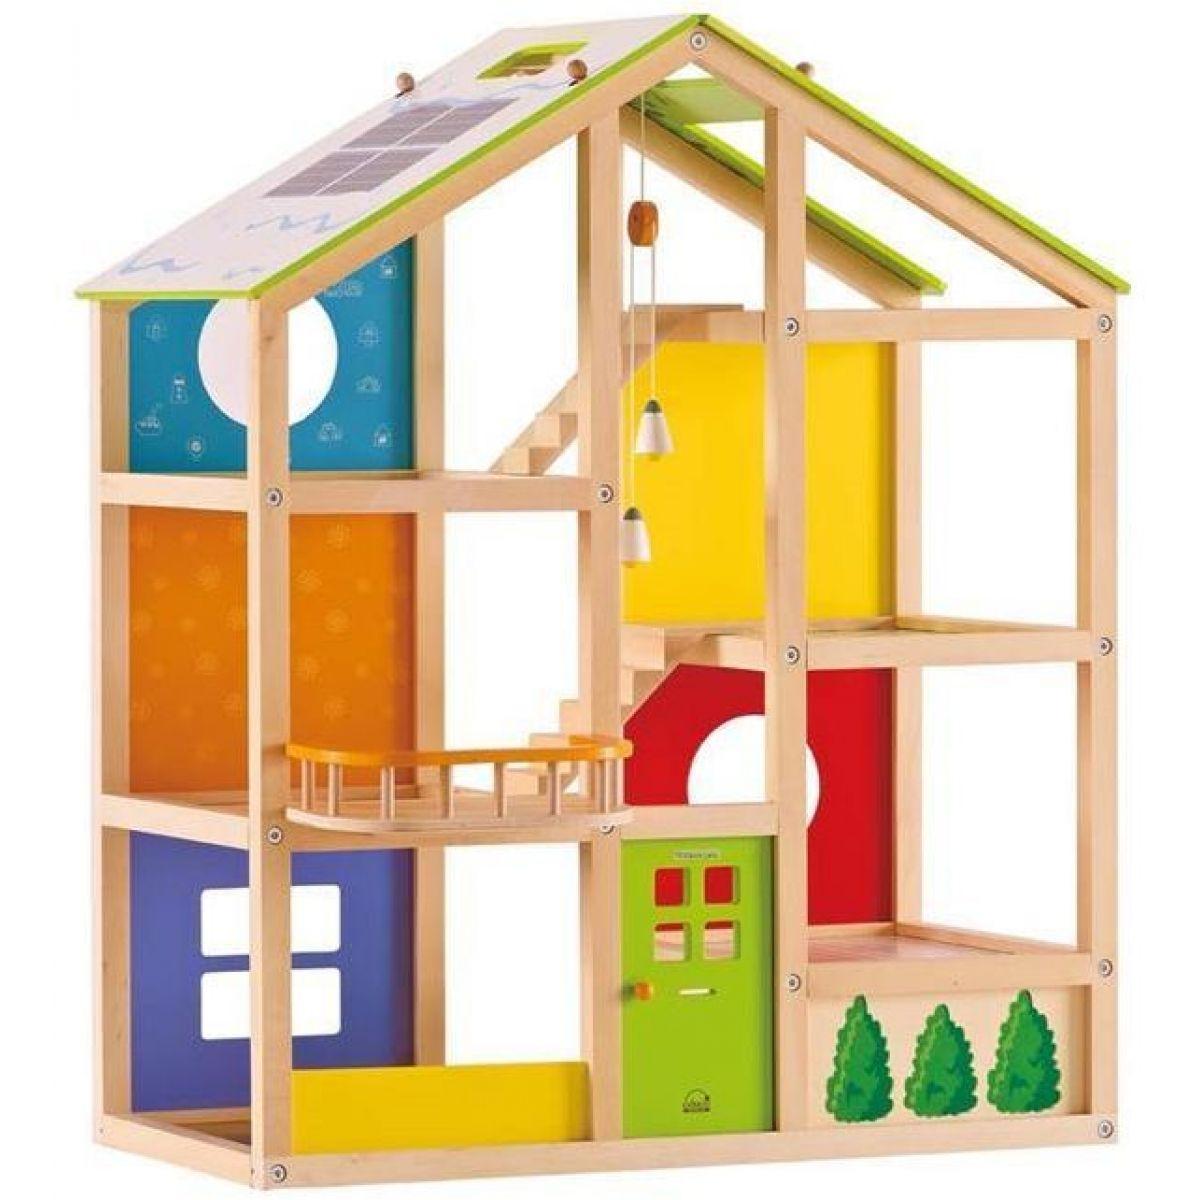 Hape Toys domček pre bábiky